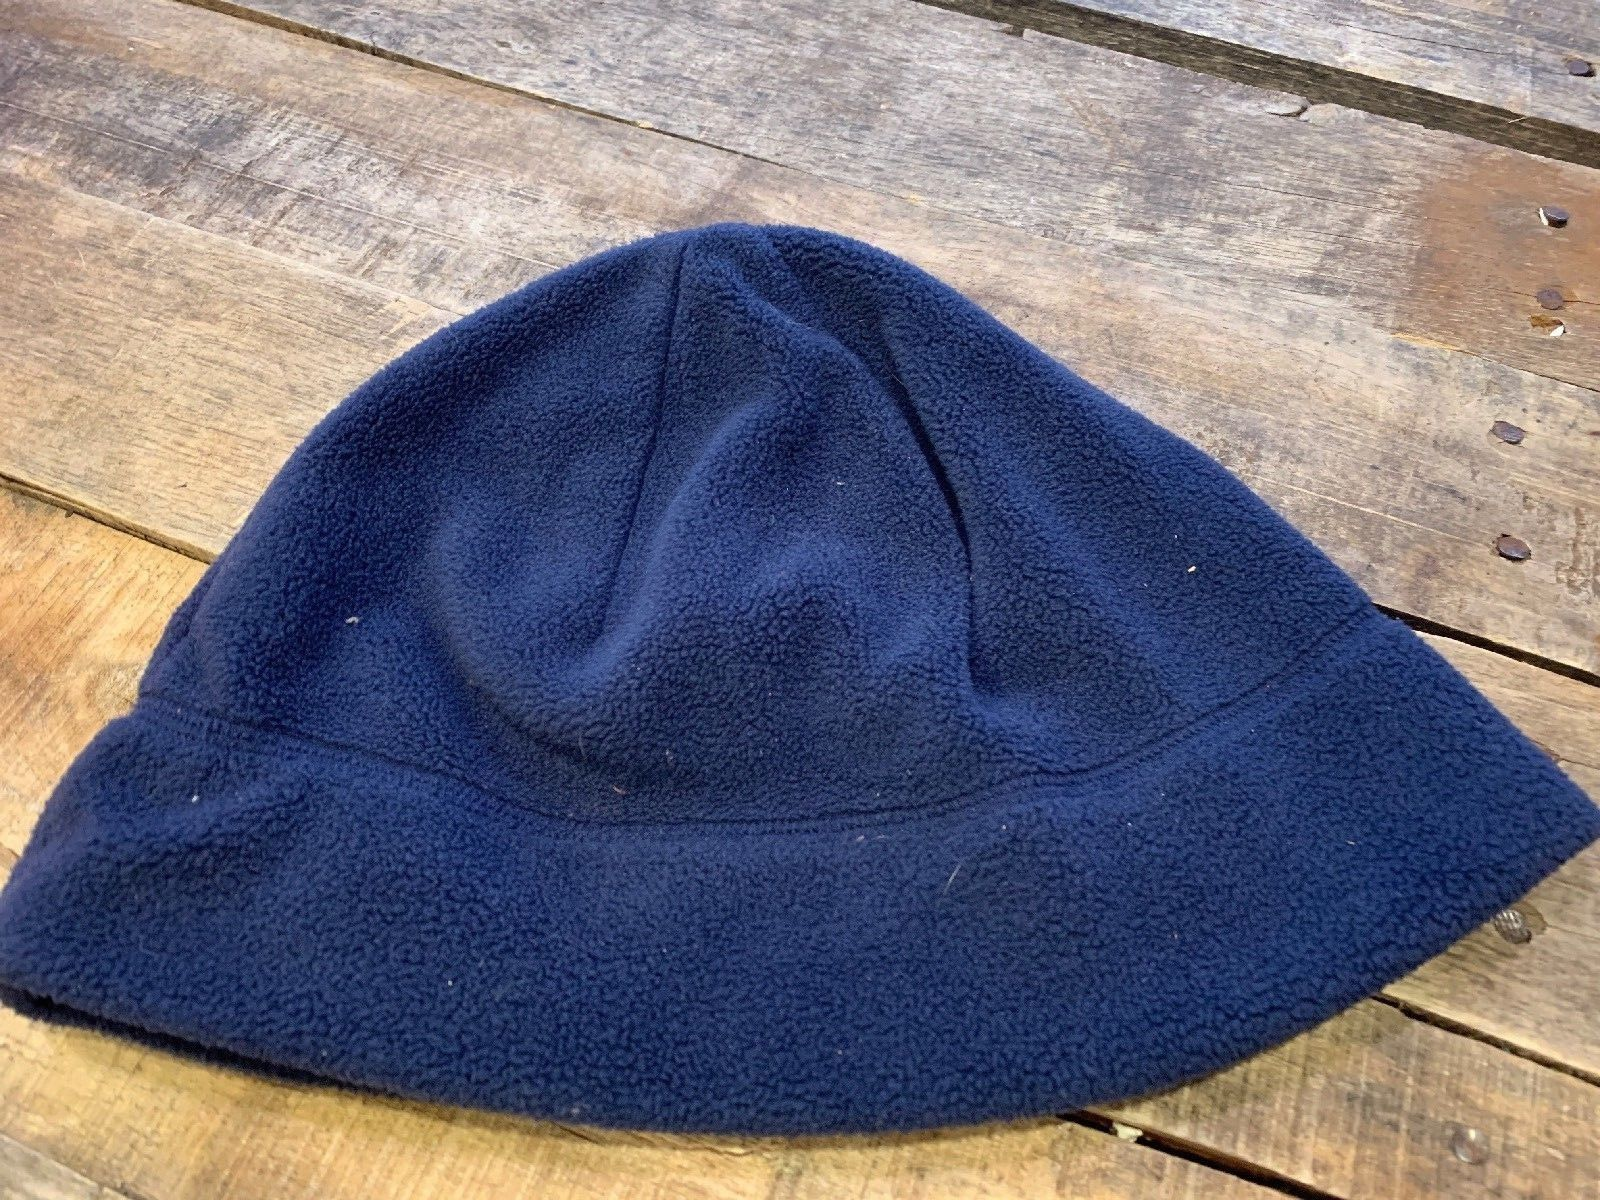 COLUMBIA Brand Skull Winter Stocking Adult Cap Hat Size S/M